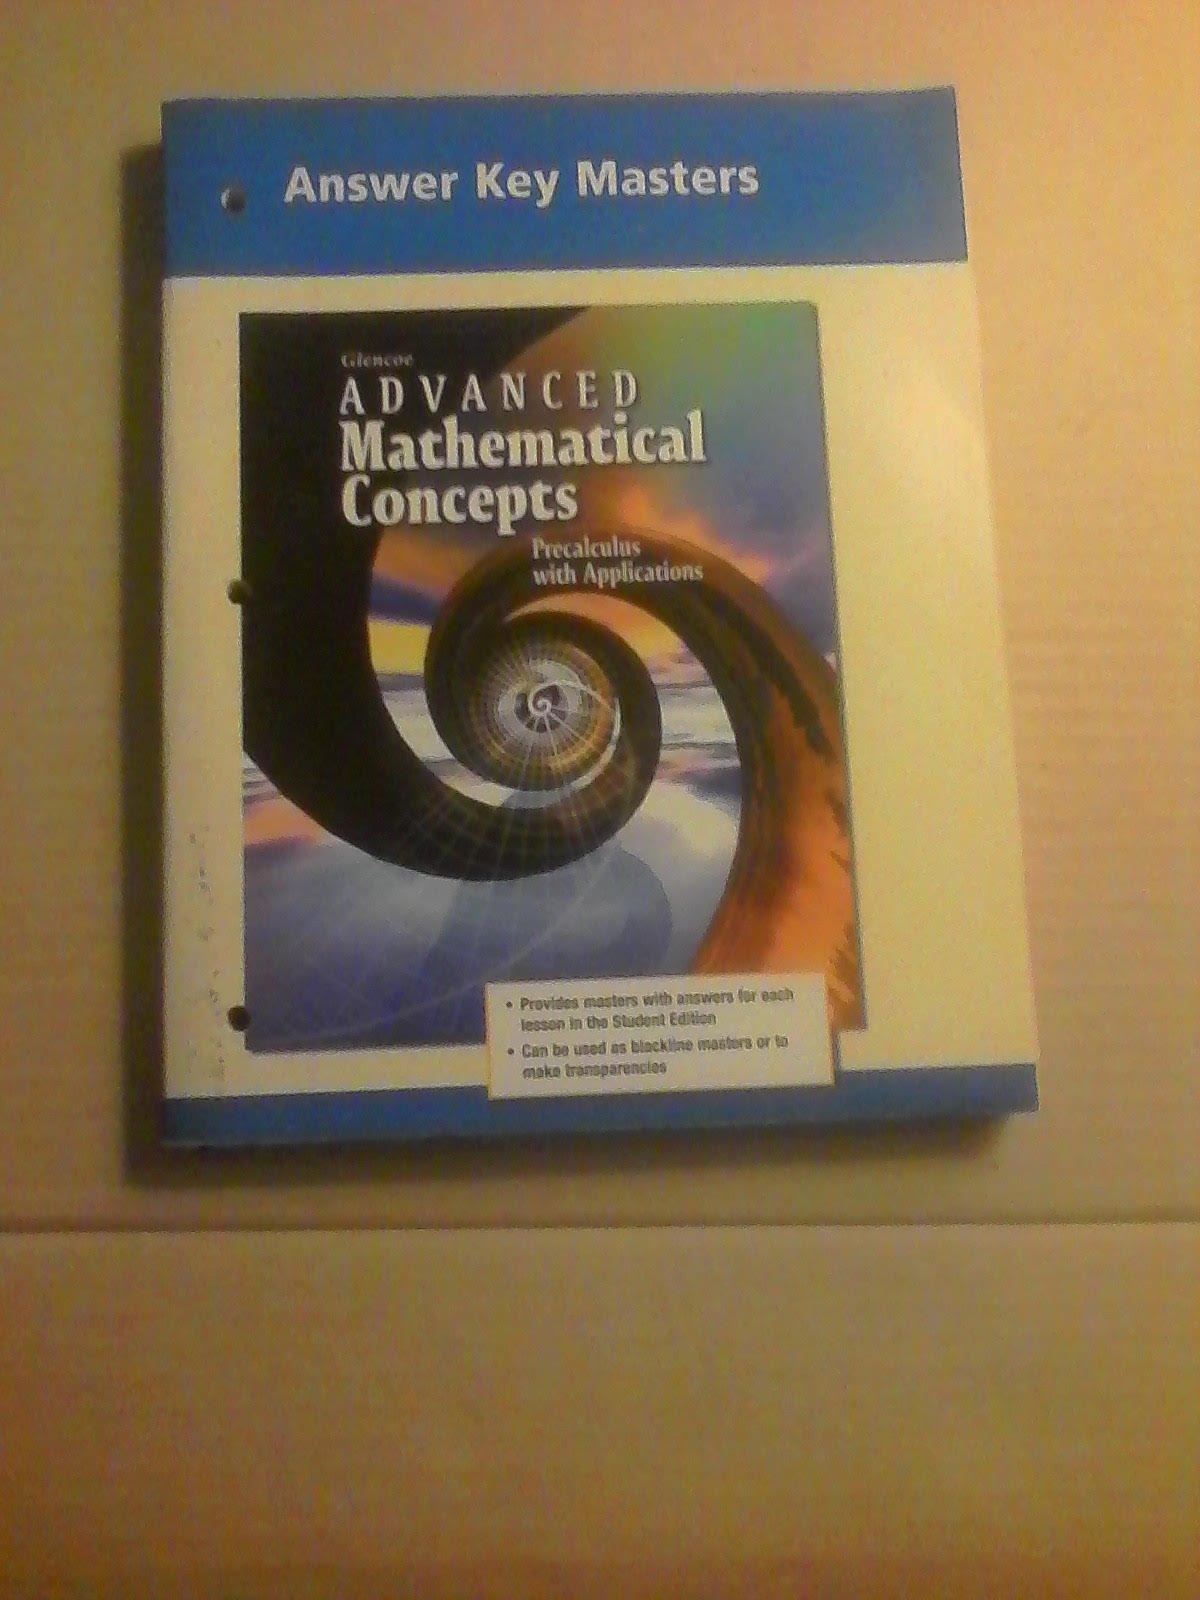 Advanced Matematical Concepts, Answer Key Masters: McGraw-Hill:  9780078230943: Amazon.com: Books